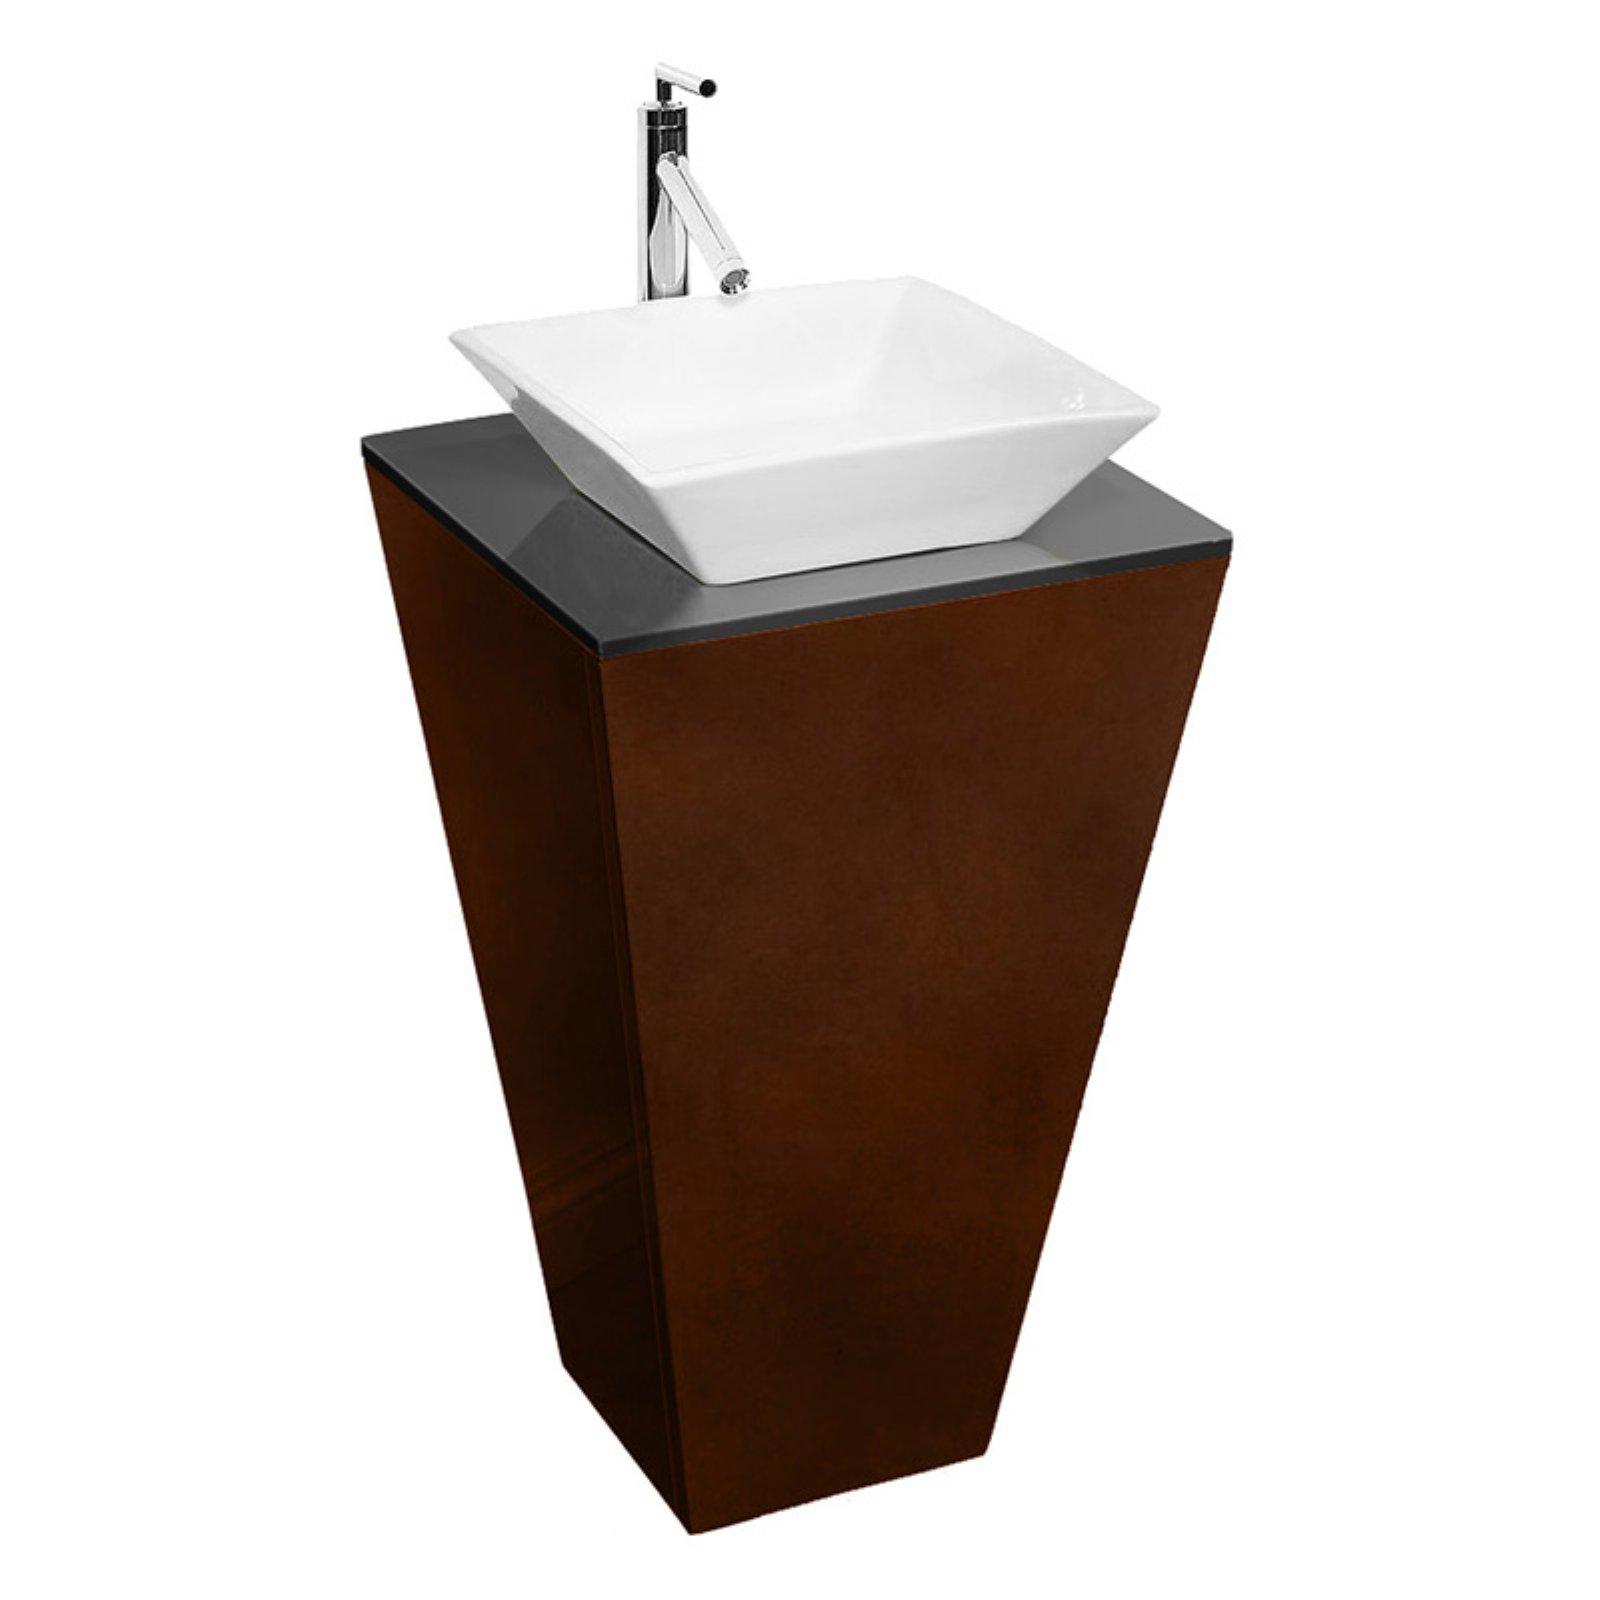 Wyndham Collection Wc Cs004e Ts Espirit 20 125 In Single Bathroom Vanity Set Glass Vanity Single Bathroom Vanity Sink